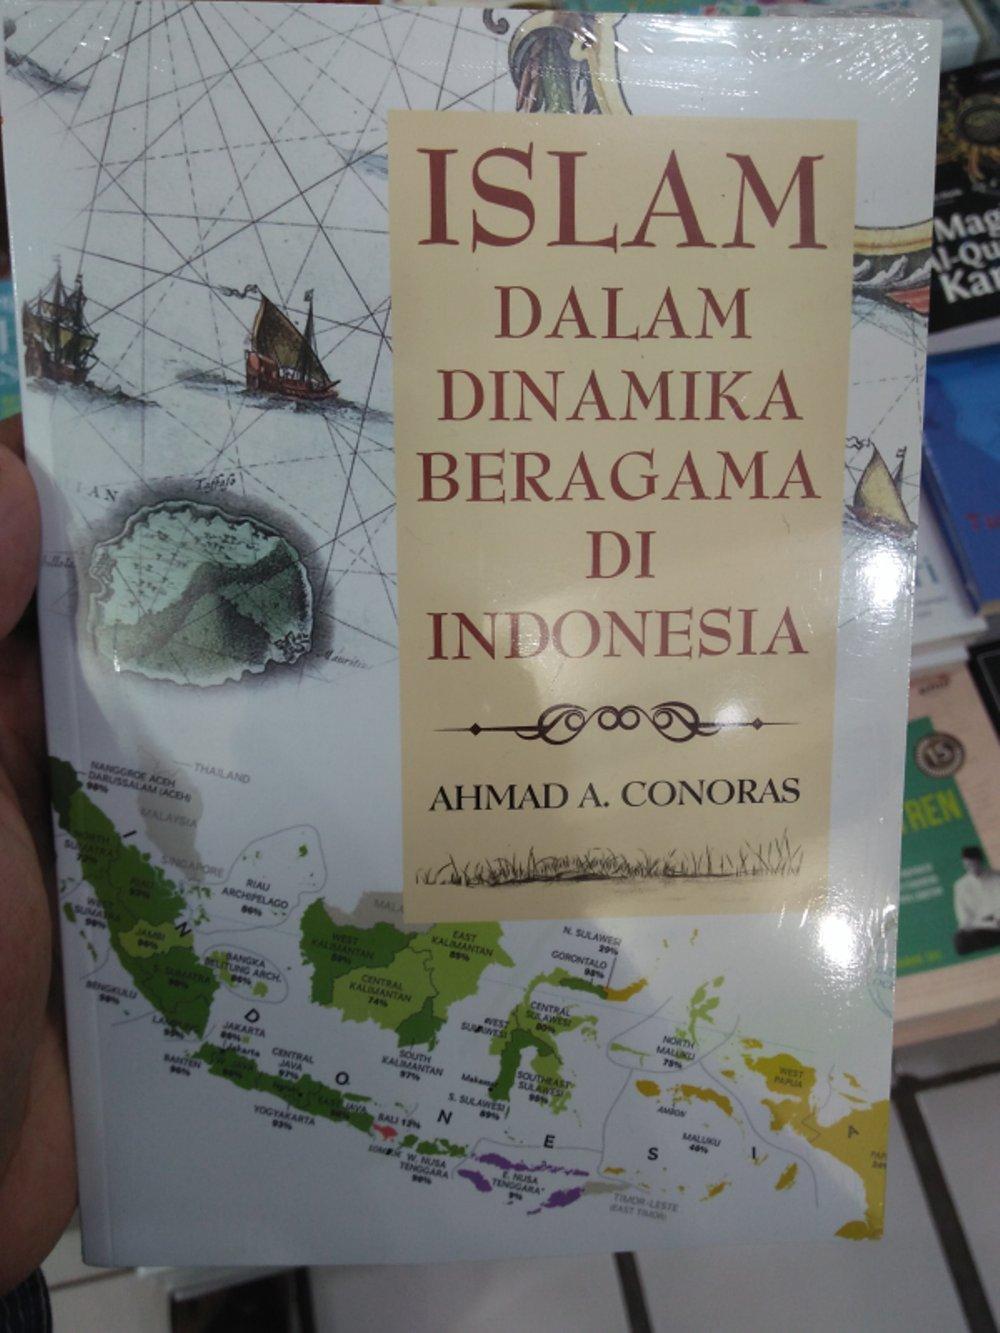 Islam Dalam Dinamika Beragama Di Indonesia - Ahmad. A Conoras By Metro Bookstore Malang.